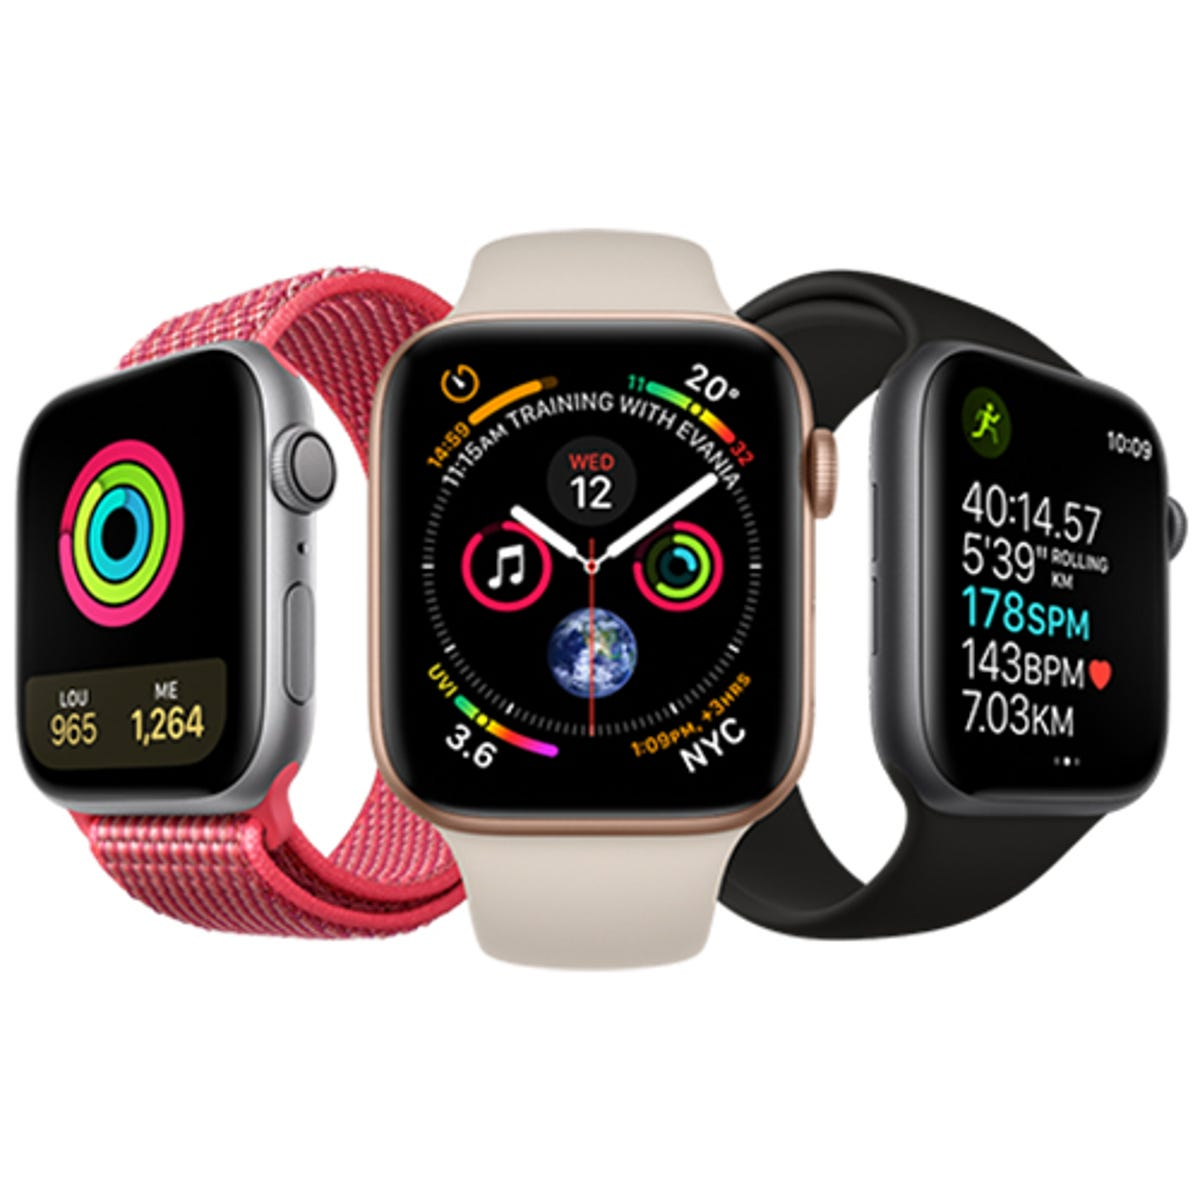 prix compétitif 446d3 b1e91 Apple Watch: Series 5, 4, 3 & 2 | Best Buy Canada